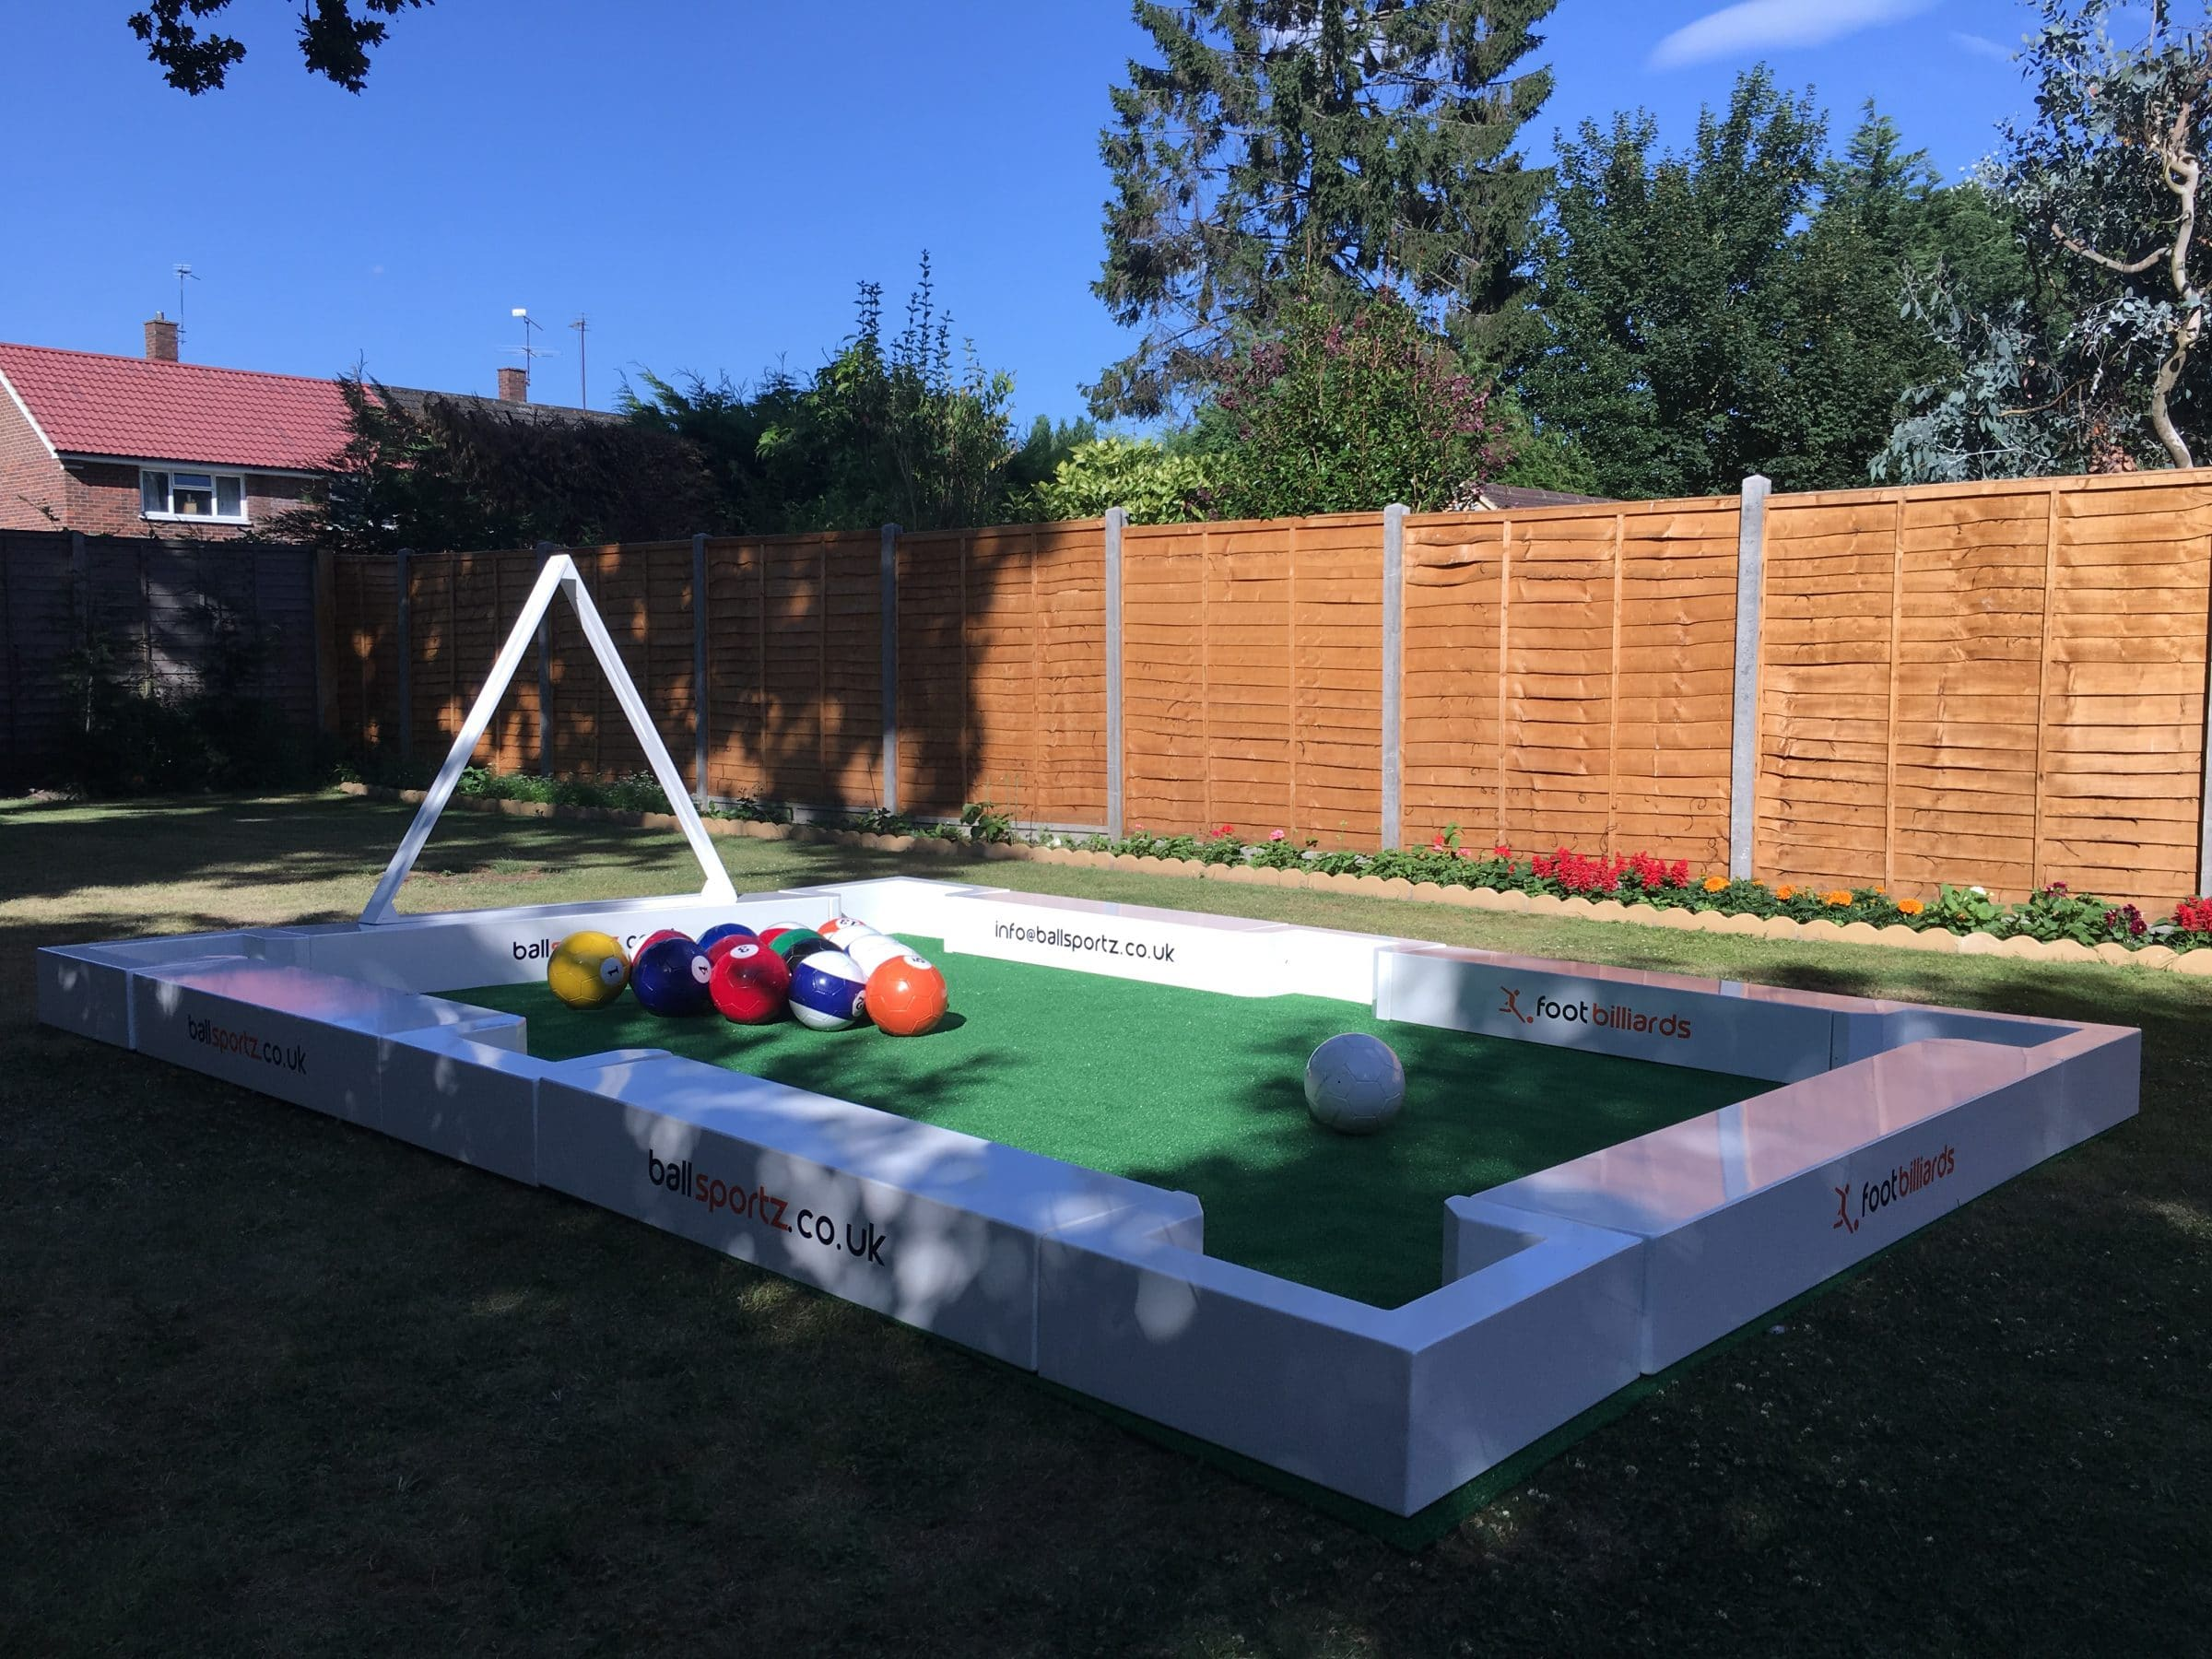 buy a football pool table foot billiards foot pool uk